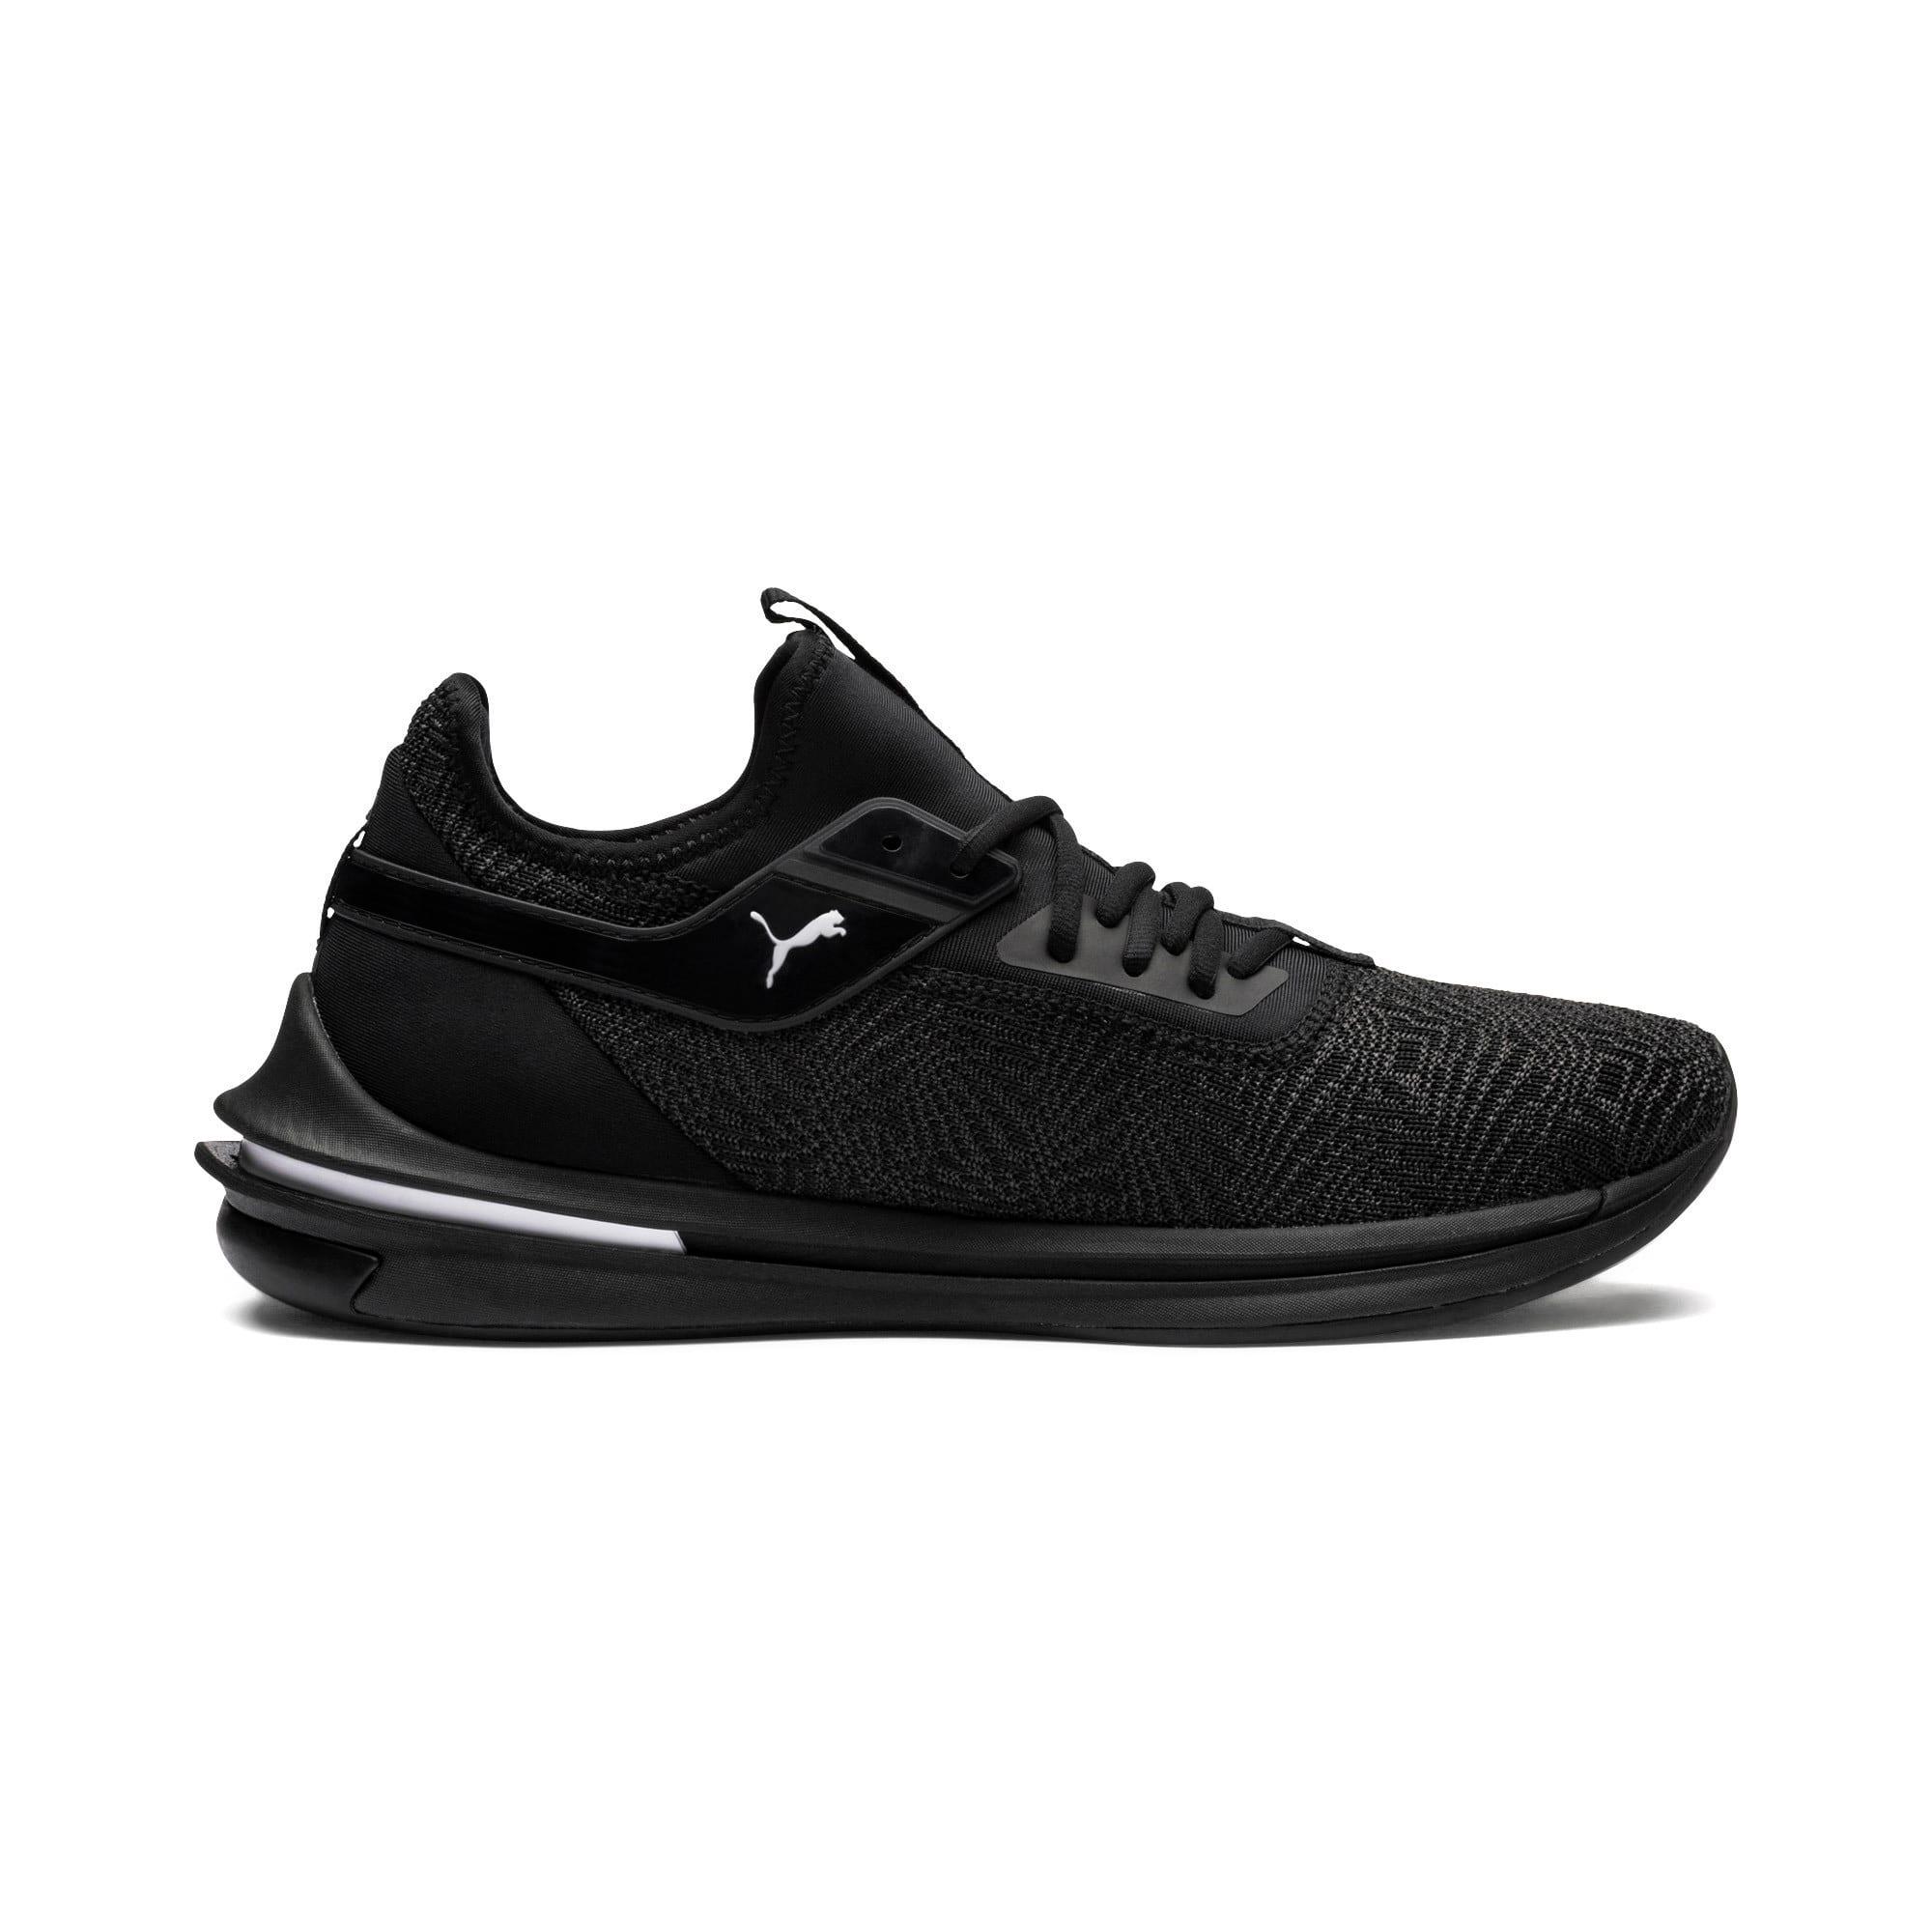 Thumbnail 5 of IGNITE Limitless SR-71 Running Shoes, Puma Black, medium